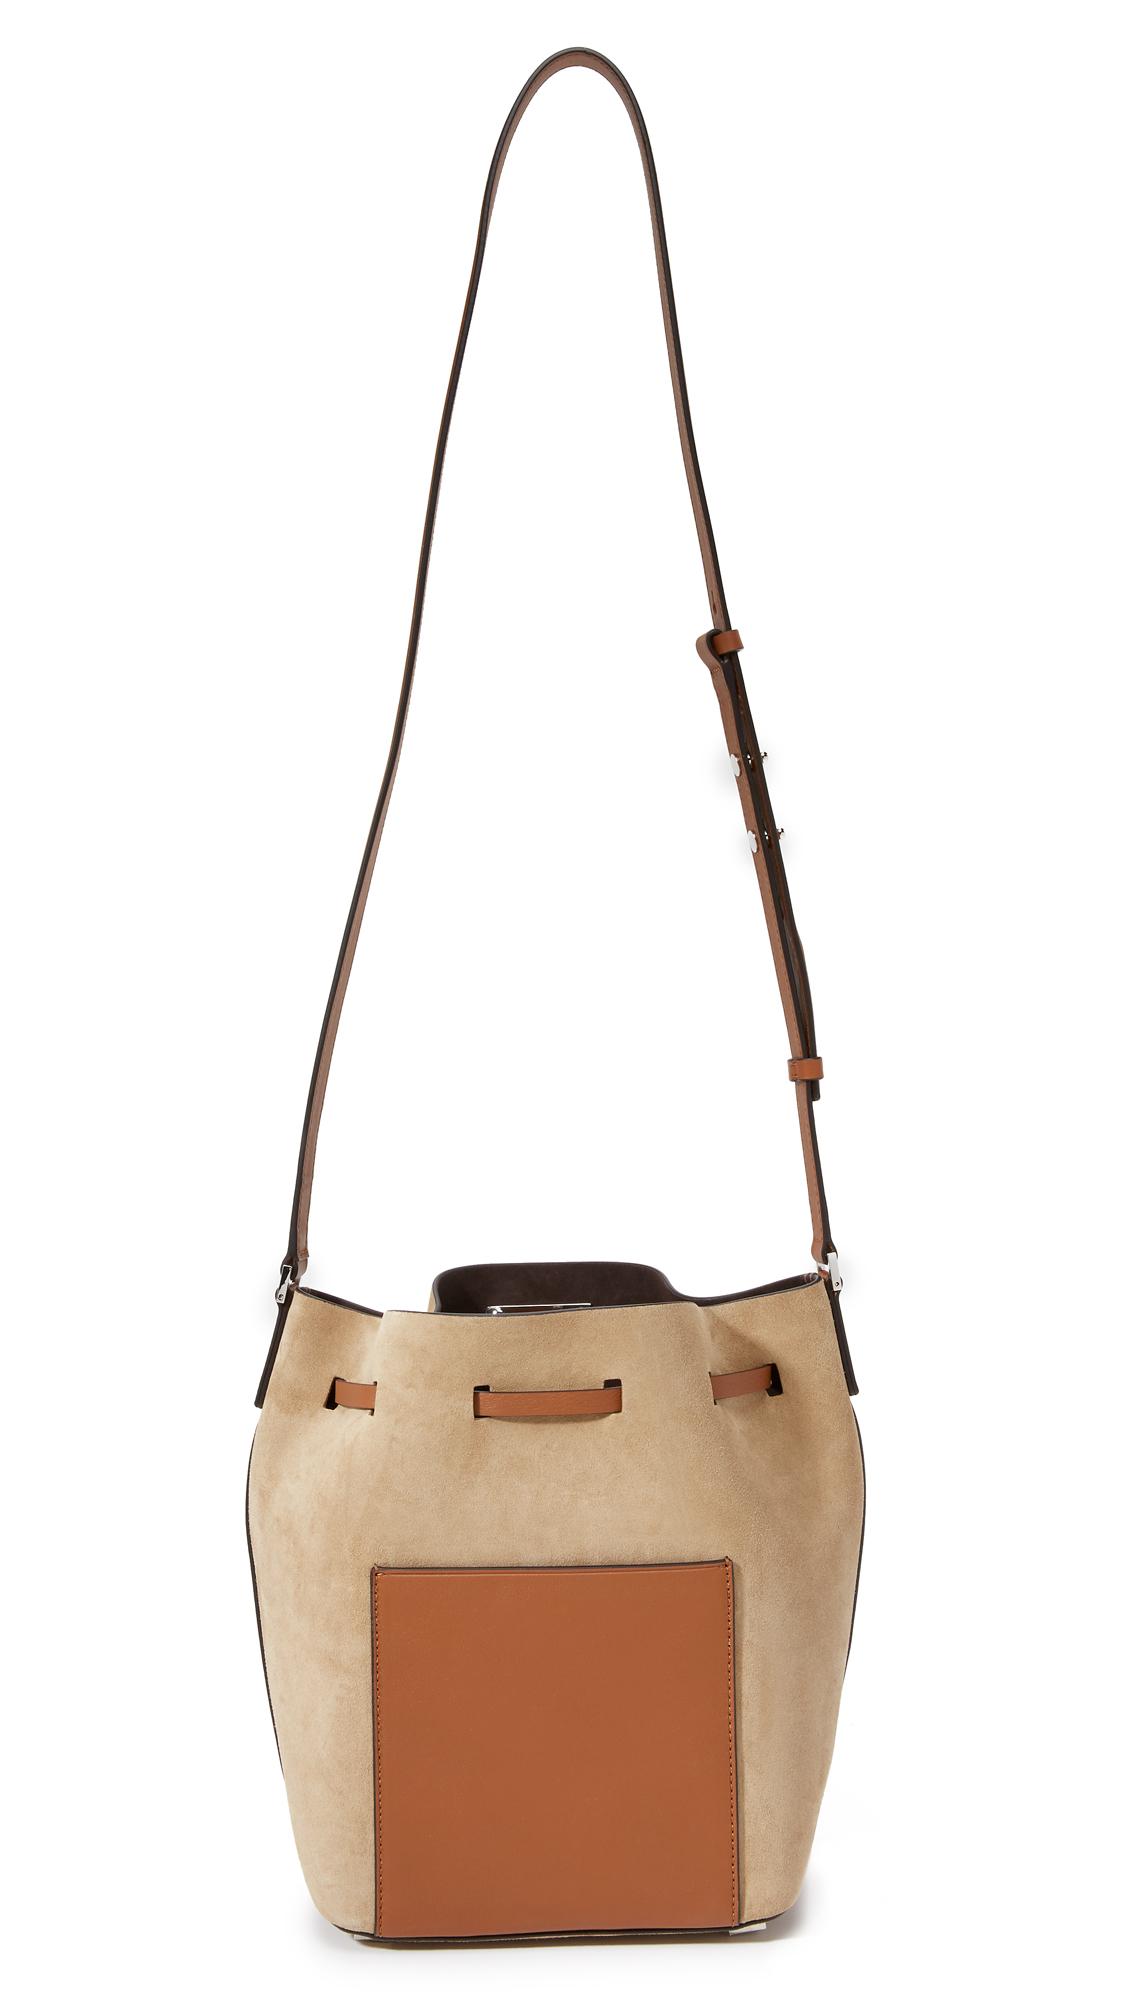 f00dc44dea377c Gallery. Previously sold at: Shopbop · Women's Bucket Bags Women's Michael  By Michael Kors Miranda ...